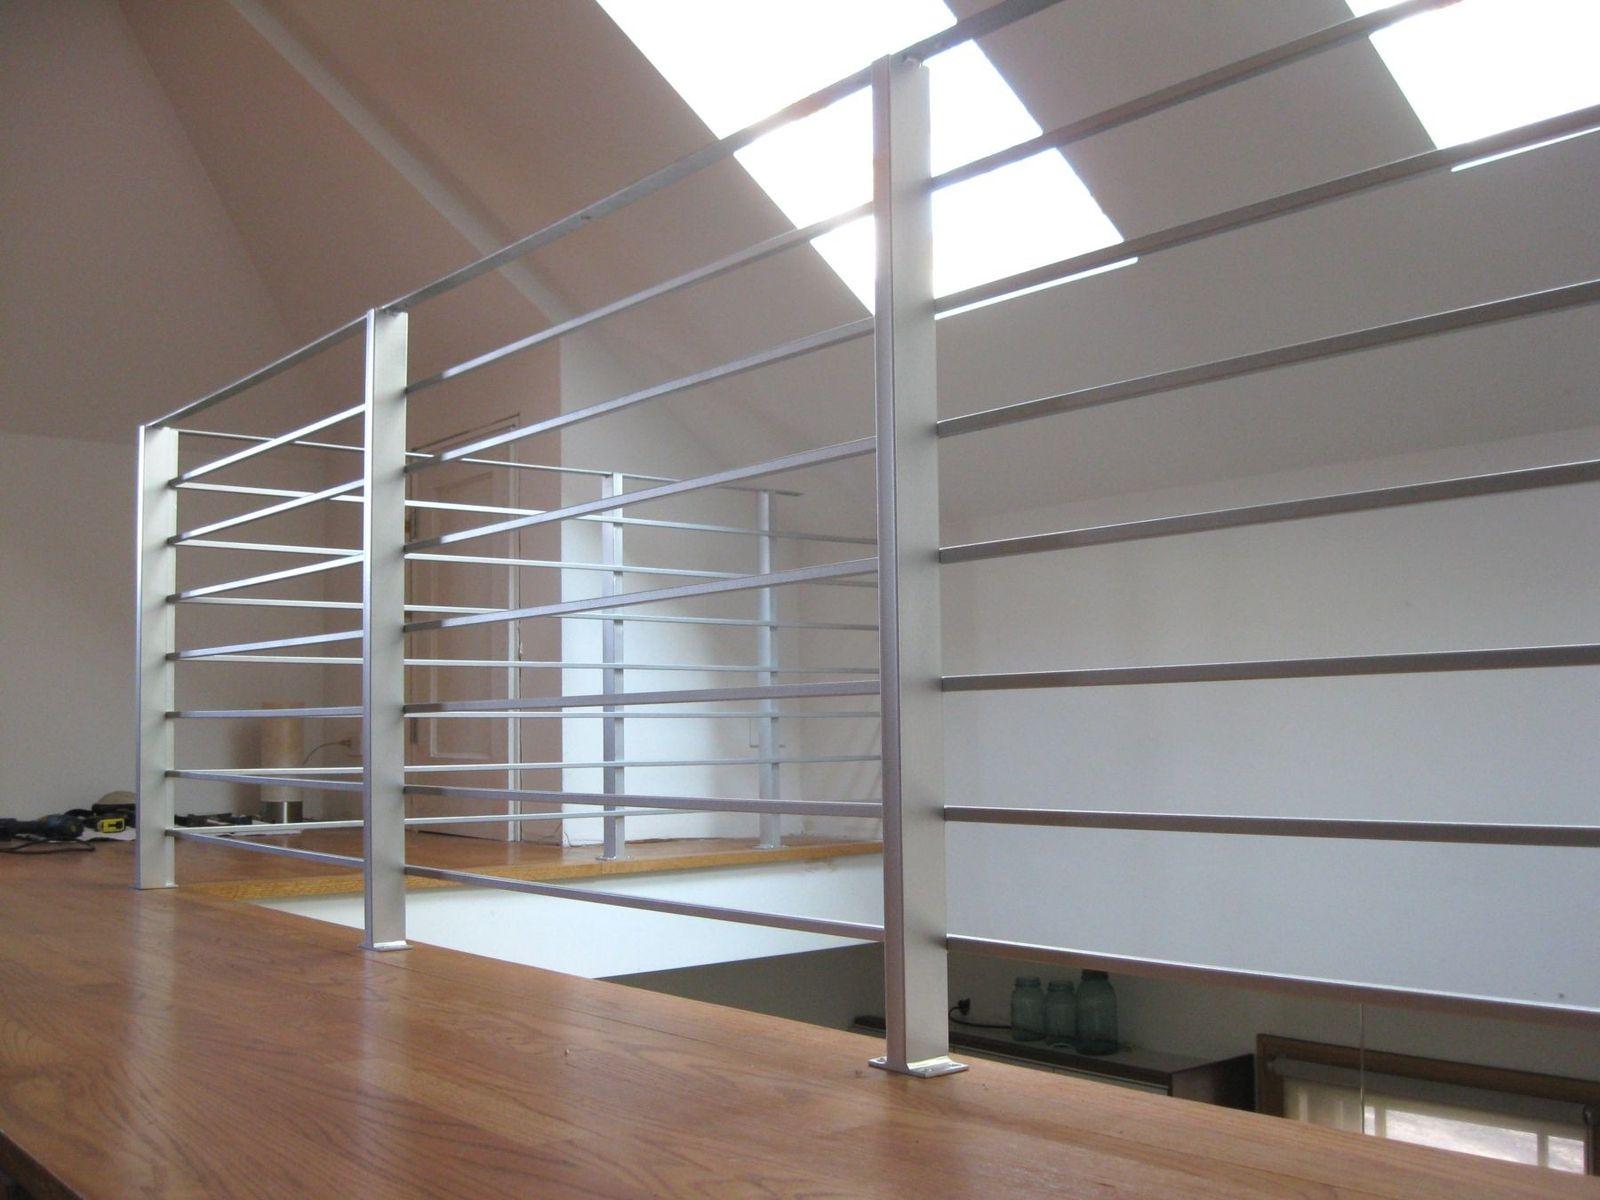 Exceptional Hand Made Modern Interior Railing By Bader Art Metal U0026 Fabrication |  CustomMade.com